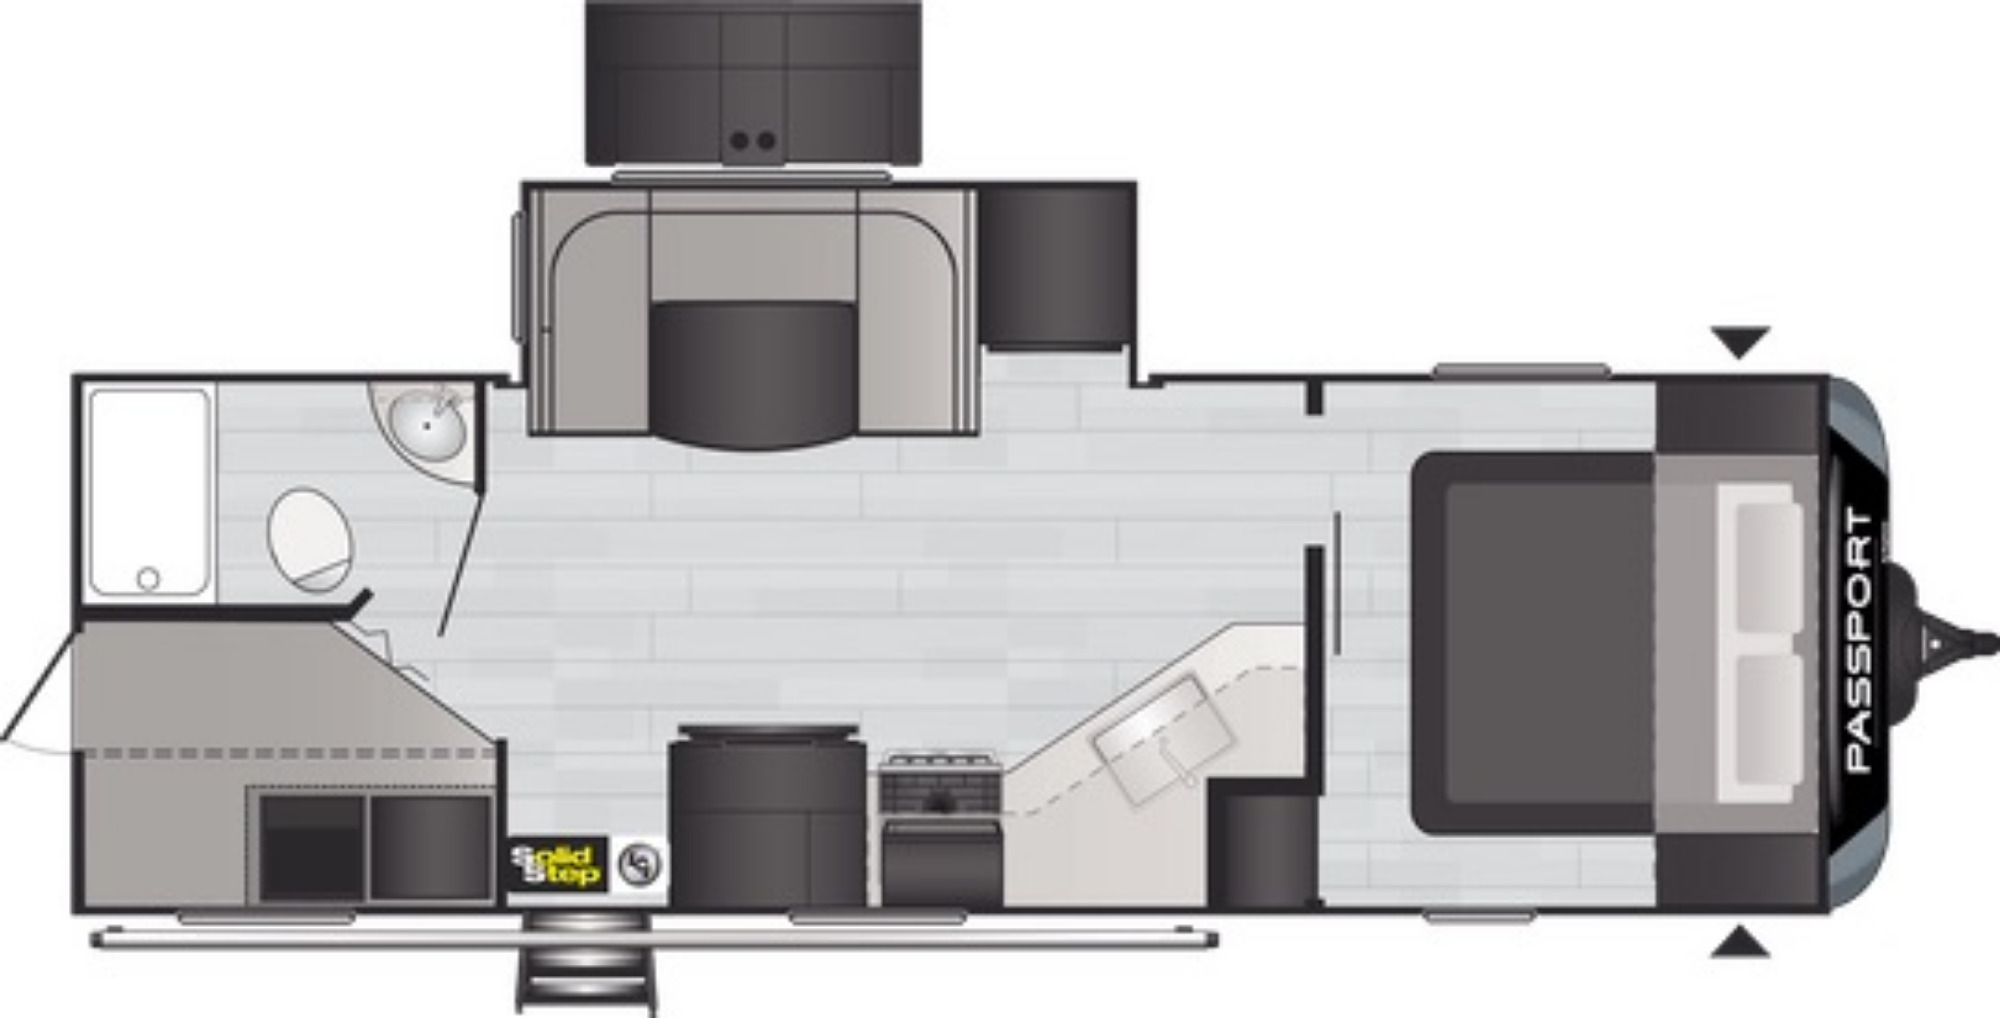 View Floor Plan for 2021 KEYSTONE PASSPORT 2600BH